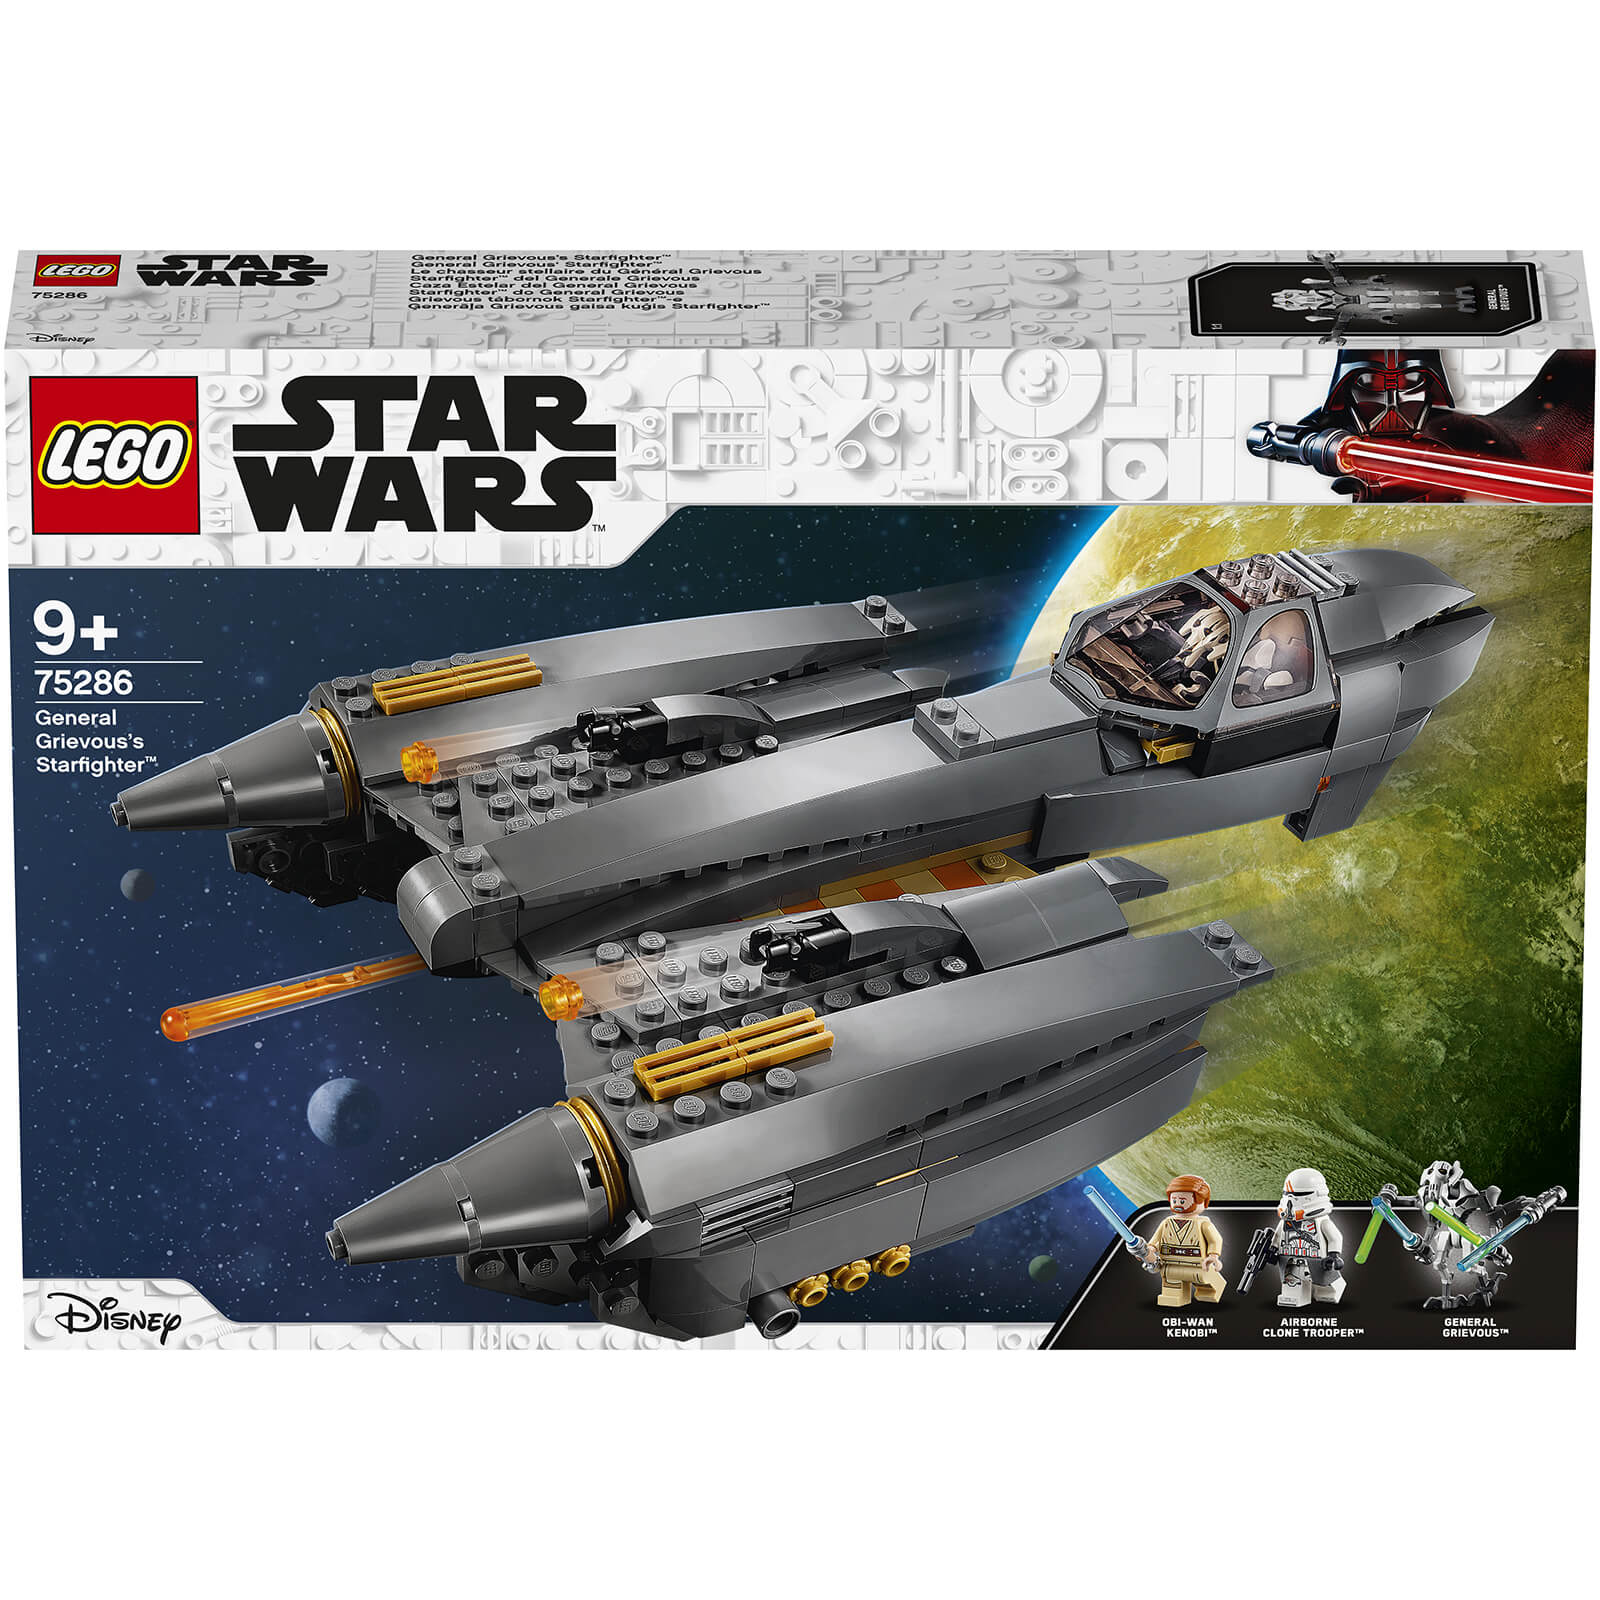 Image of LEGO Star Wars General Grievousâ??s Starfighter - 75286